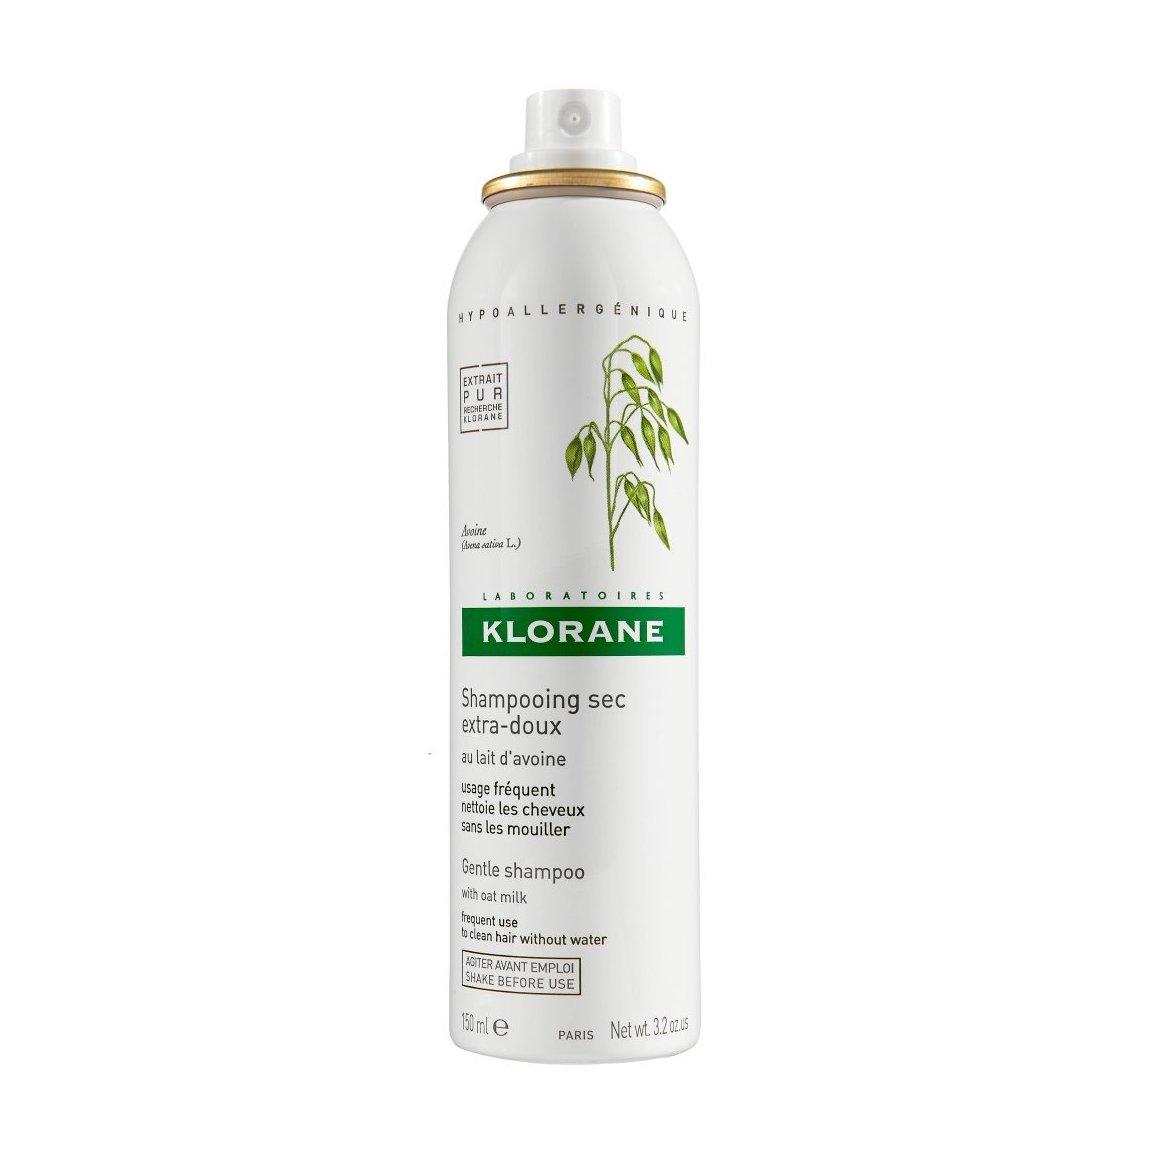 Klorane Dry Shampoo Klorane Gentle Dry Shampoo With Oat Milk Aerosol Spray Beautylish